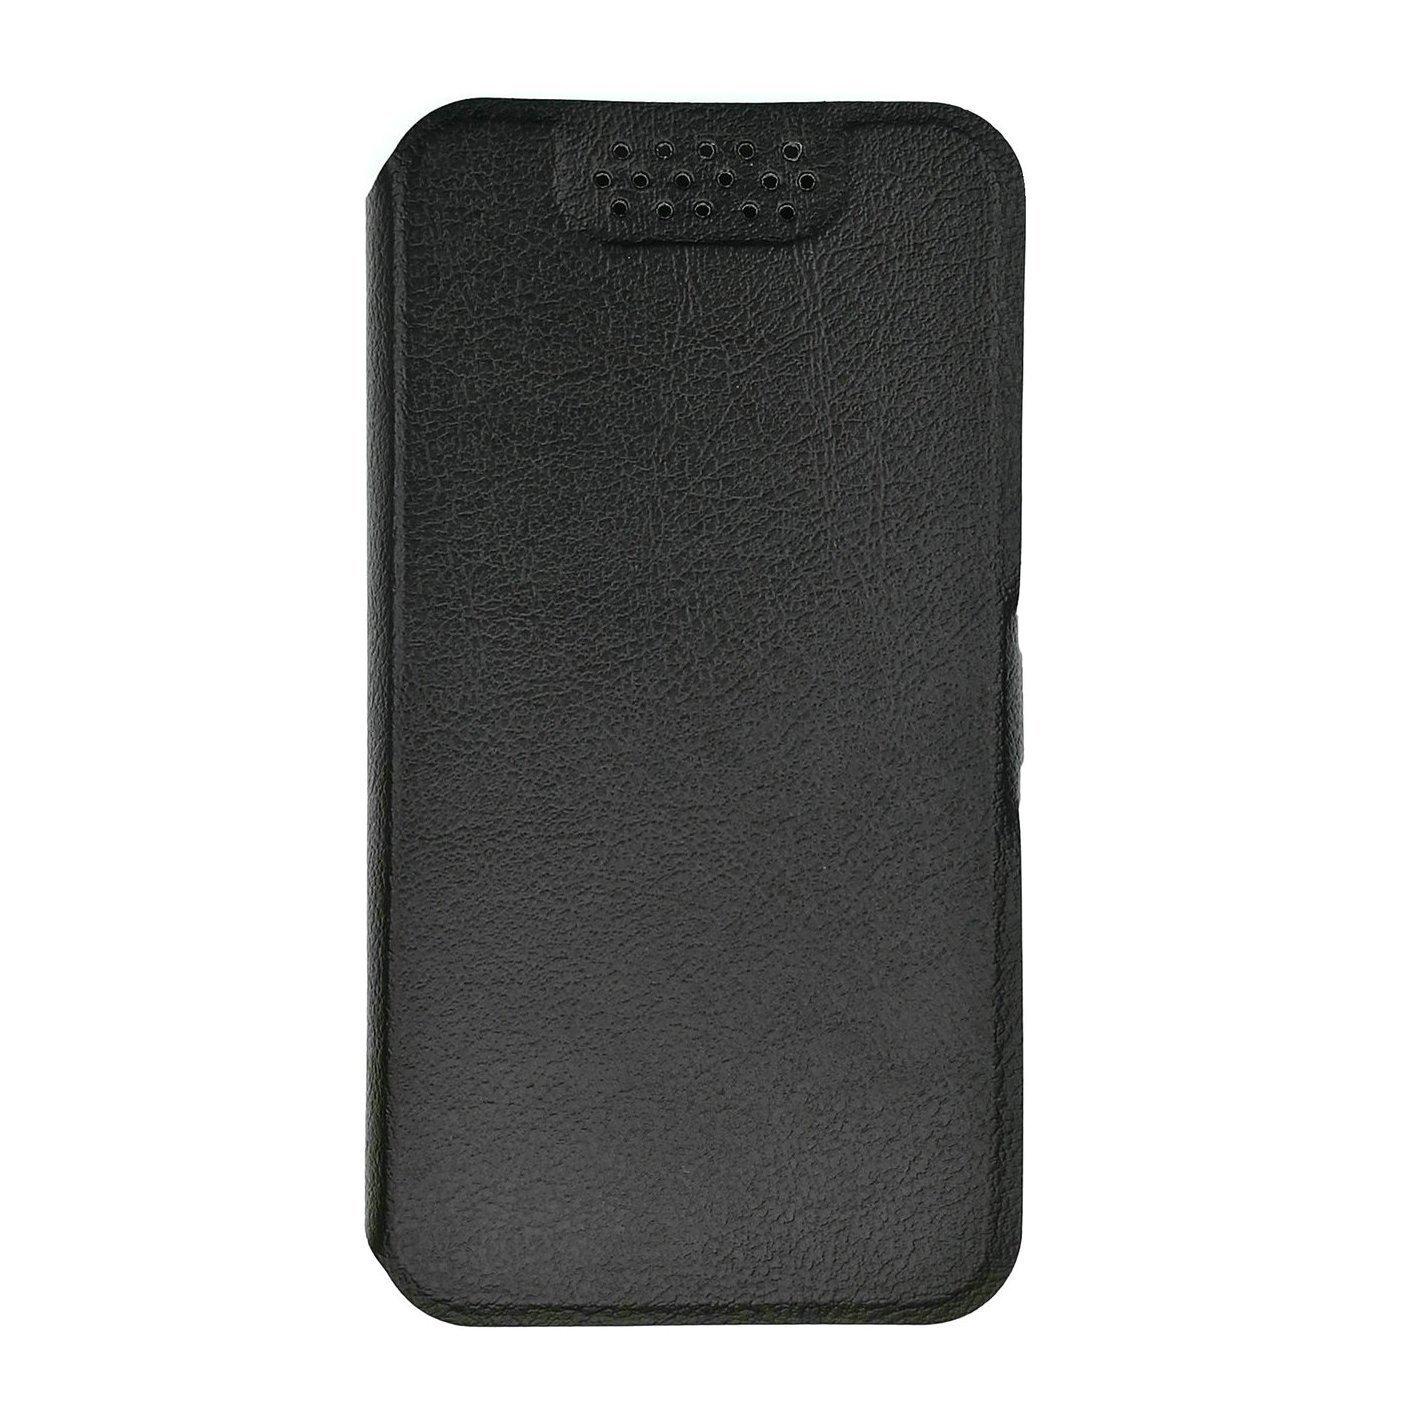 Case for Blu Dash X Lte Case Cover DK-HS